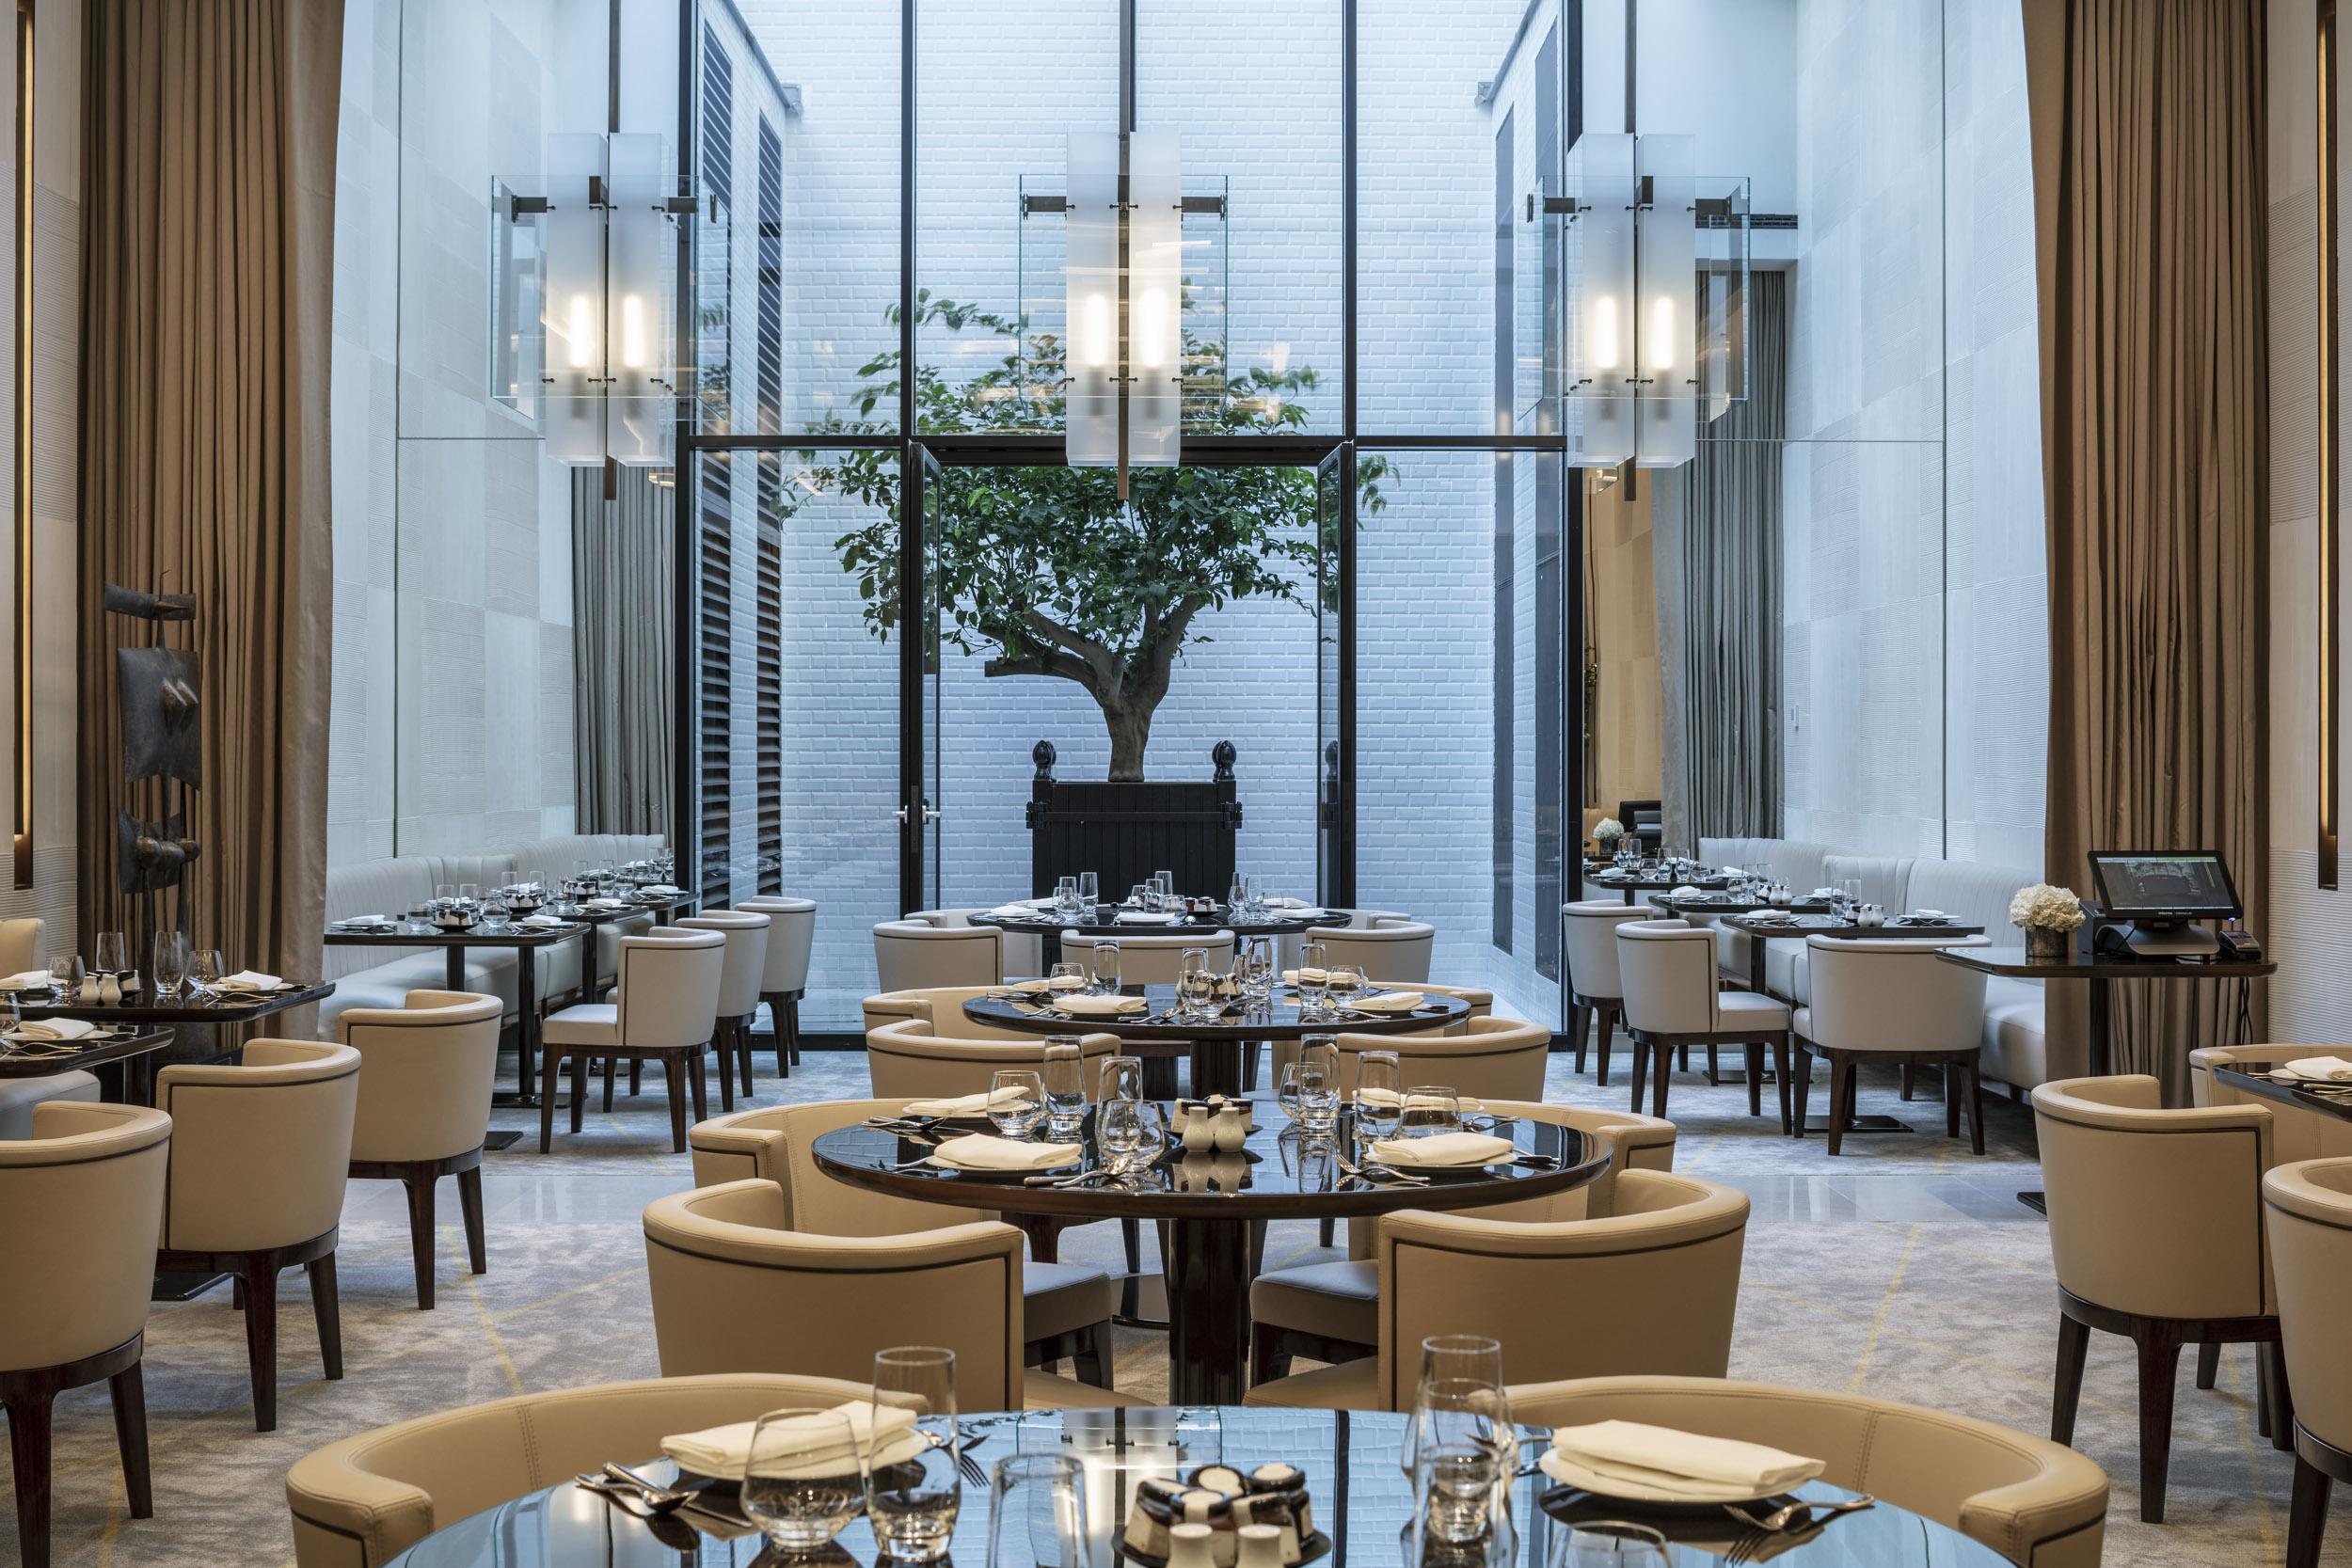 Le restaurant L'orangerie du Lutetia